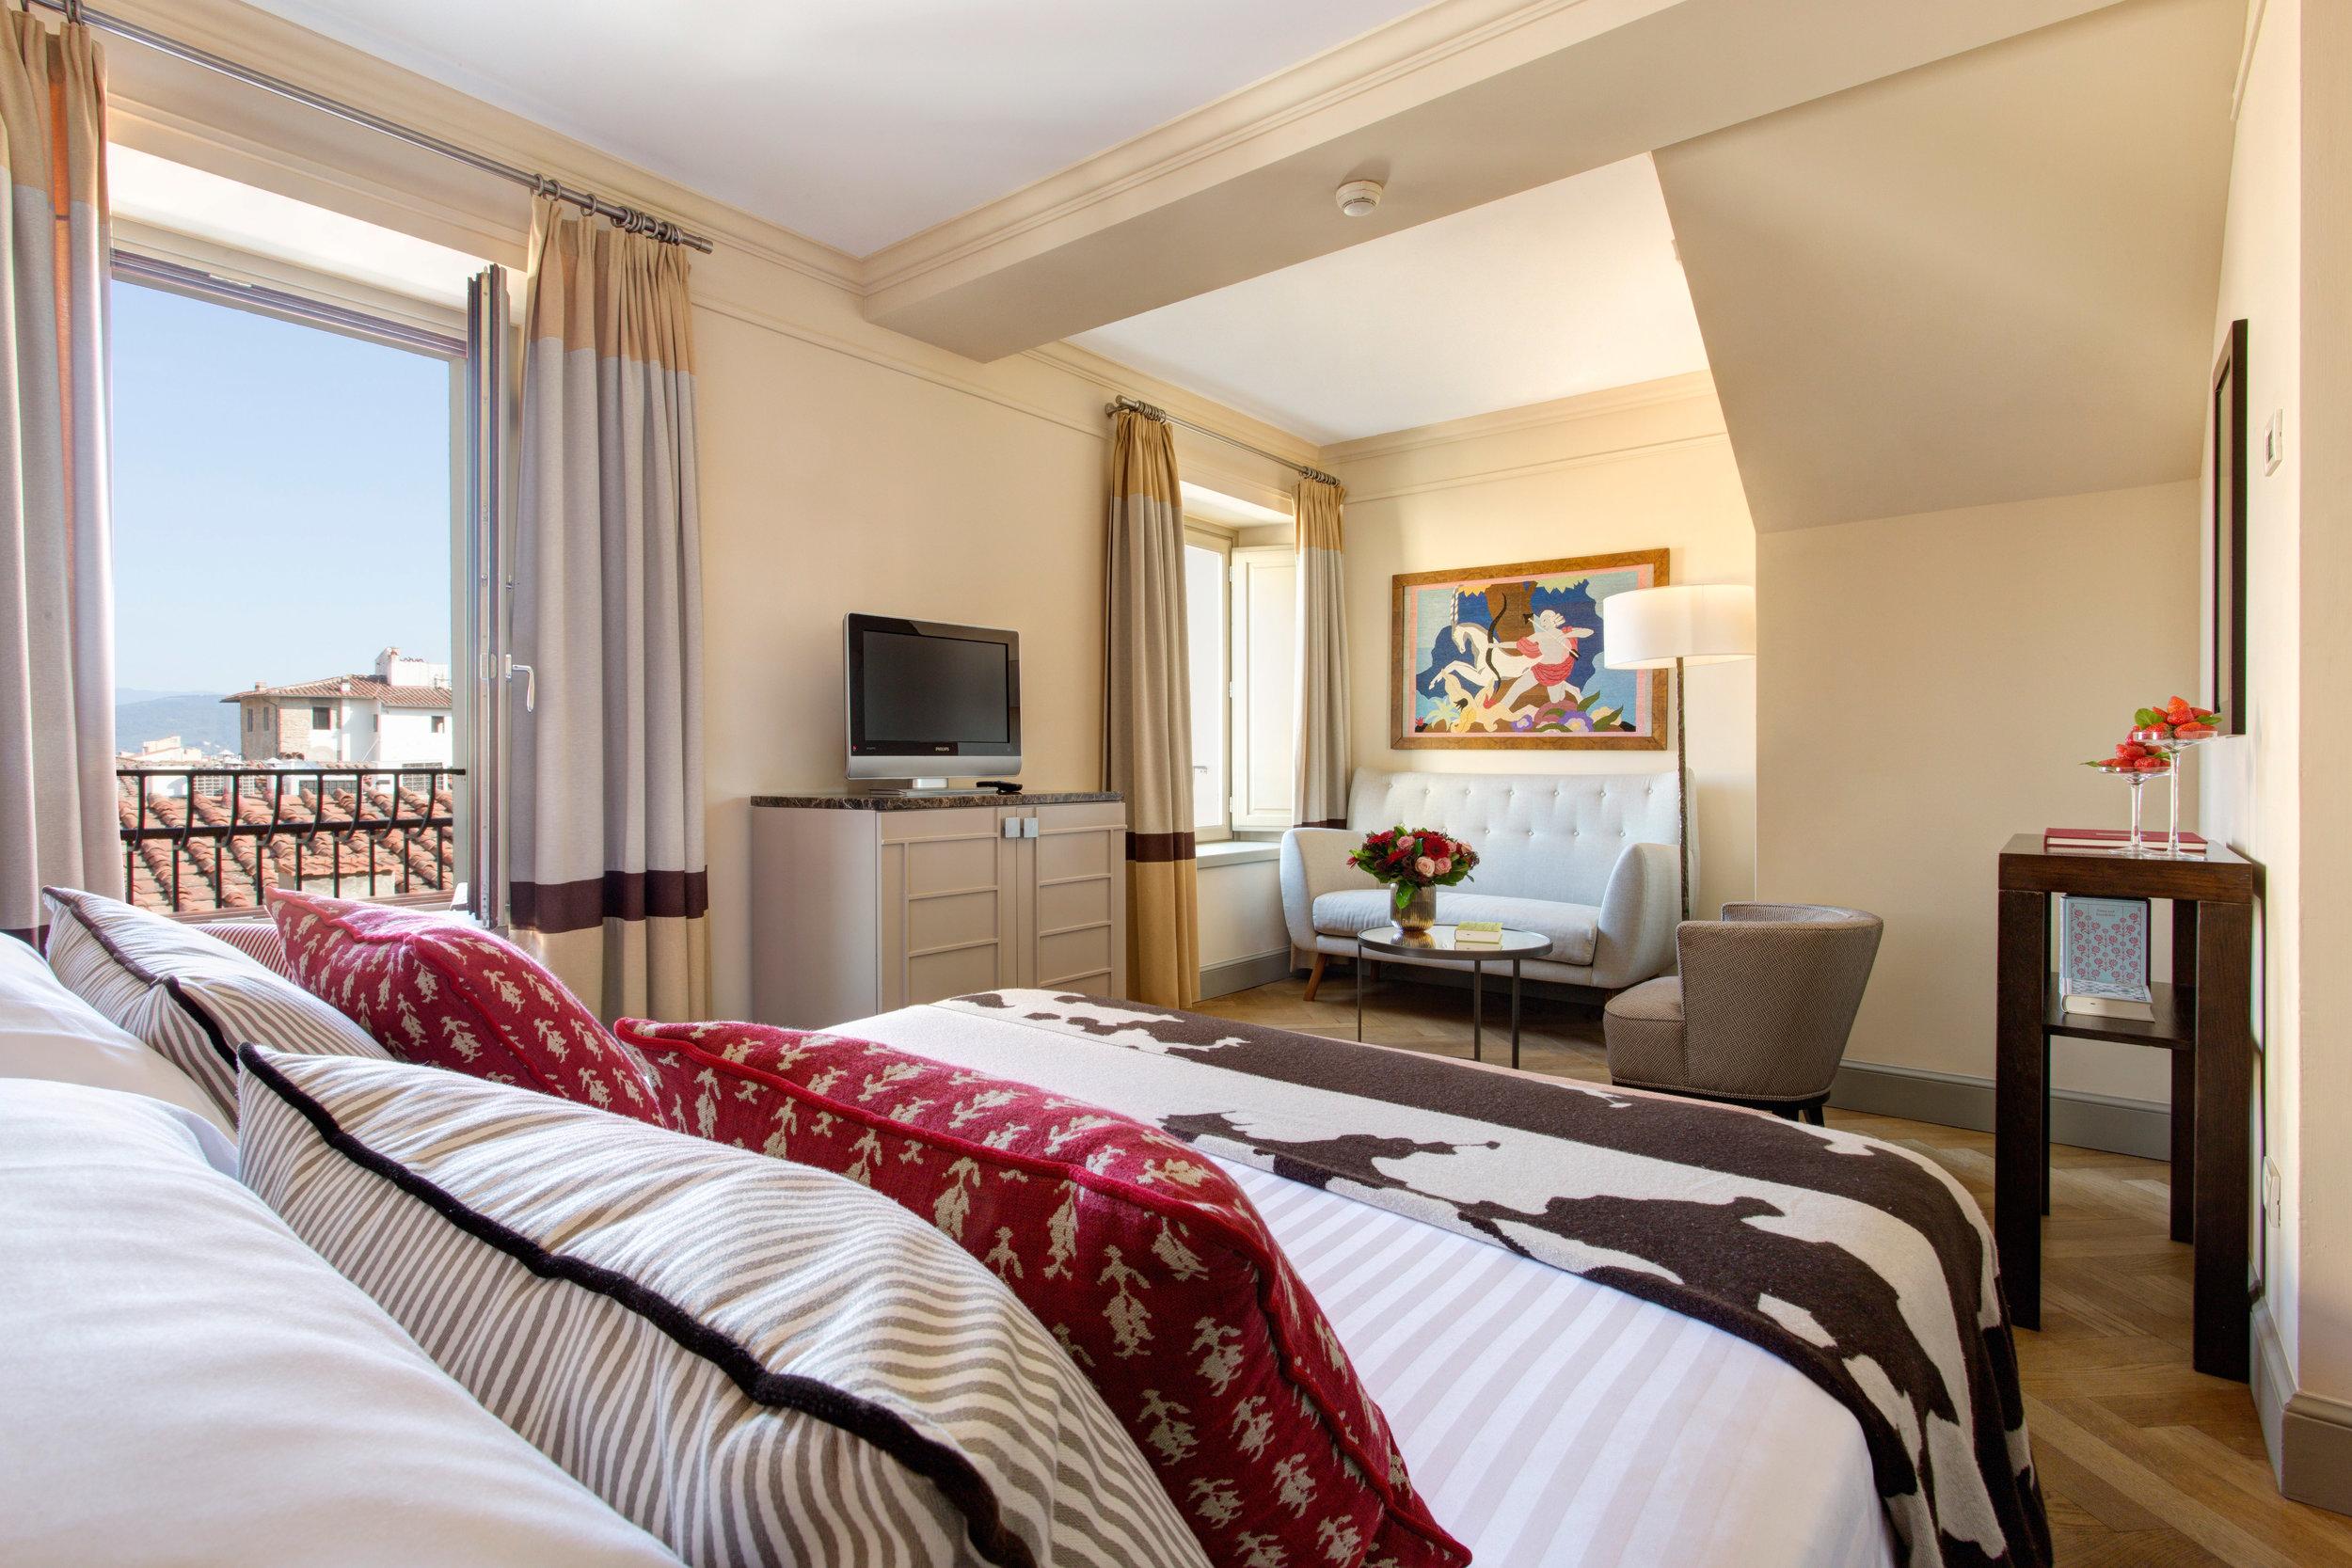 12 RFH Hotel Savoy - Deluxe Room 526 3862 JG Oct 16.JPG